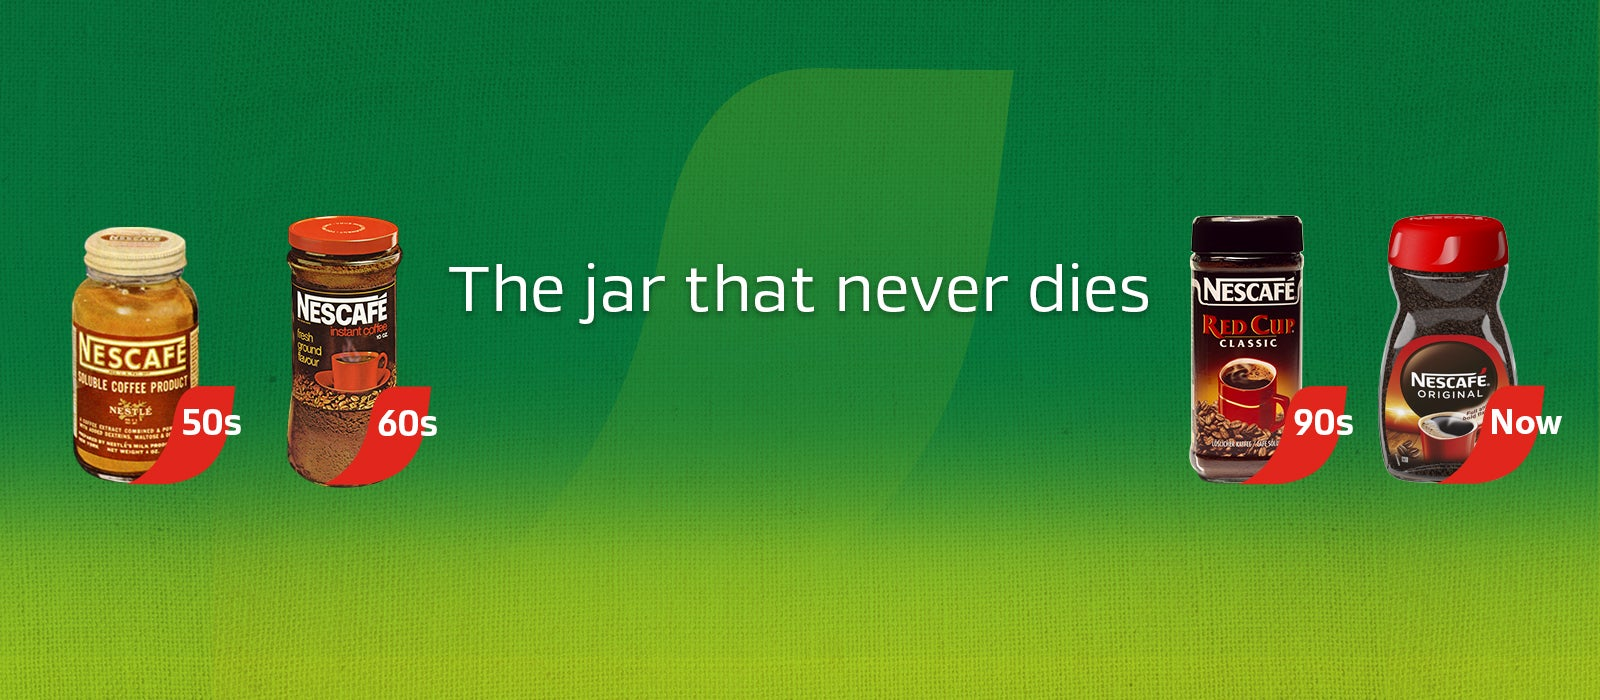 The Nescafe jar that never dies